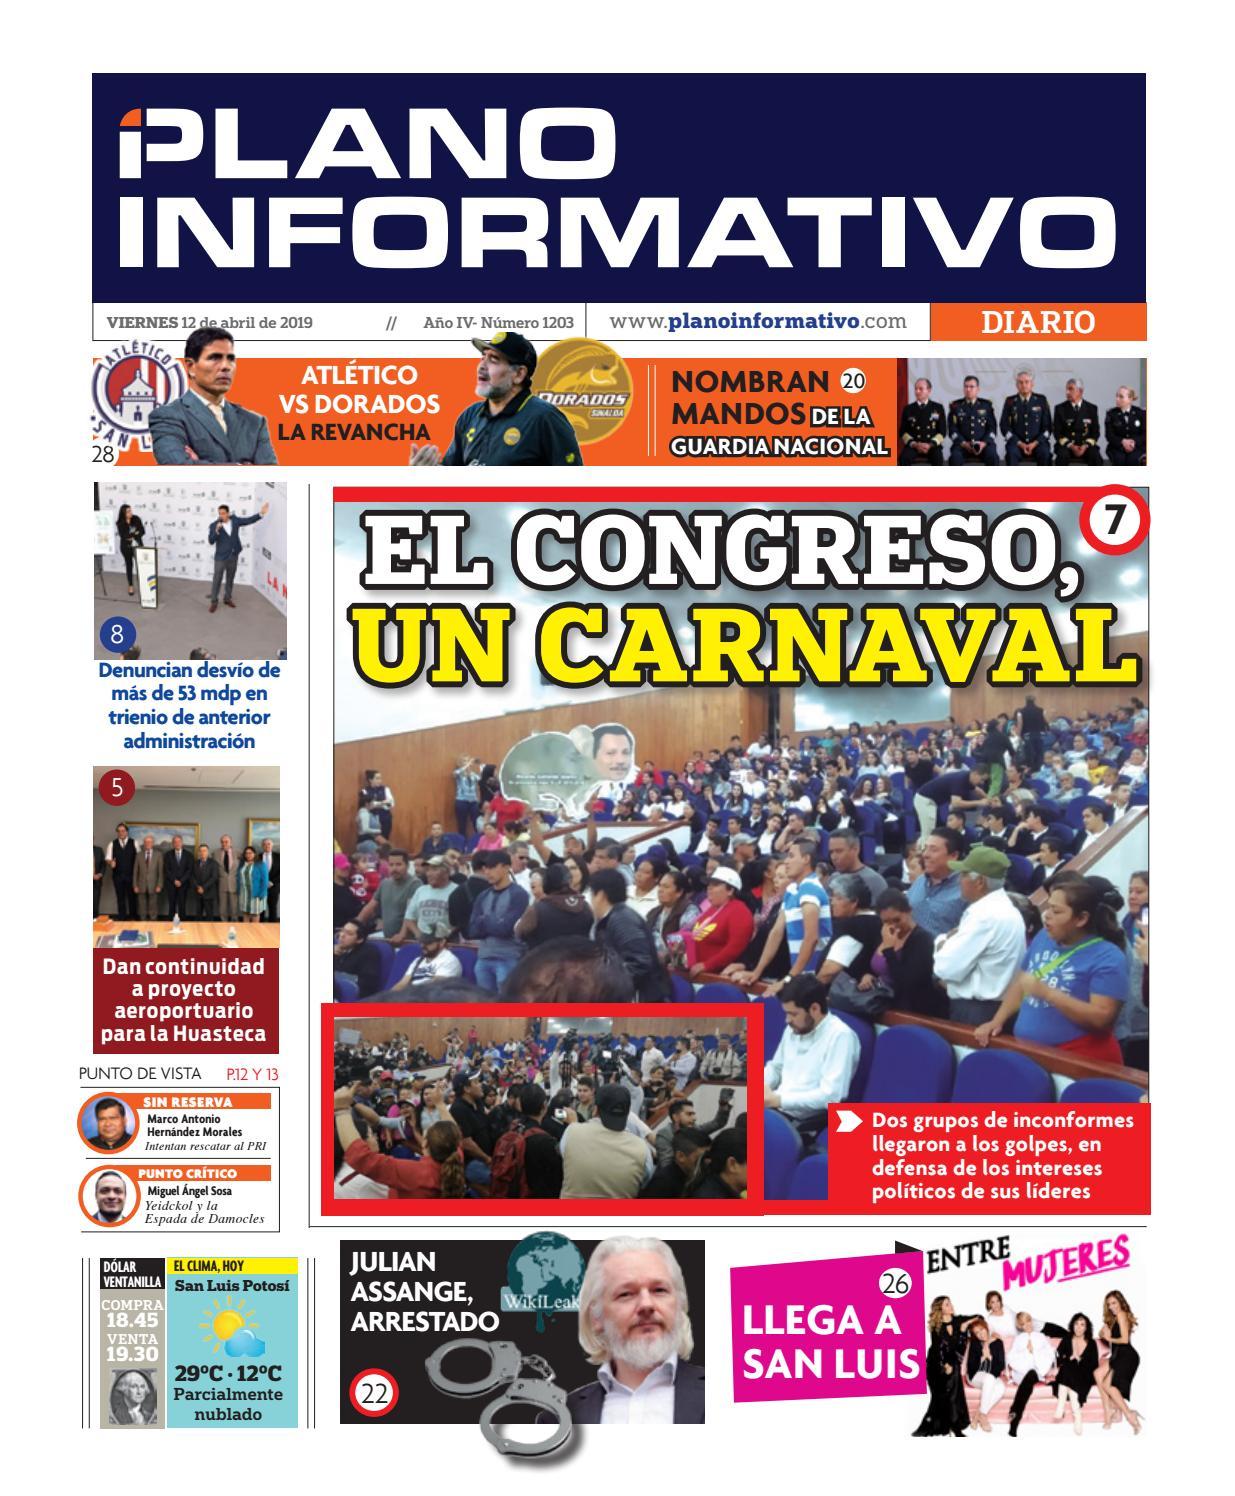 ff327dc60 Plano Informativo Impreso Año 4 No. 1203 by Plano Informativo - issuu